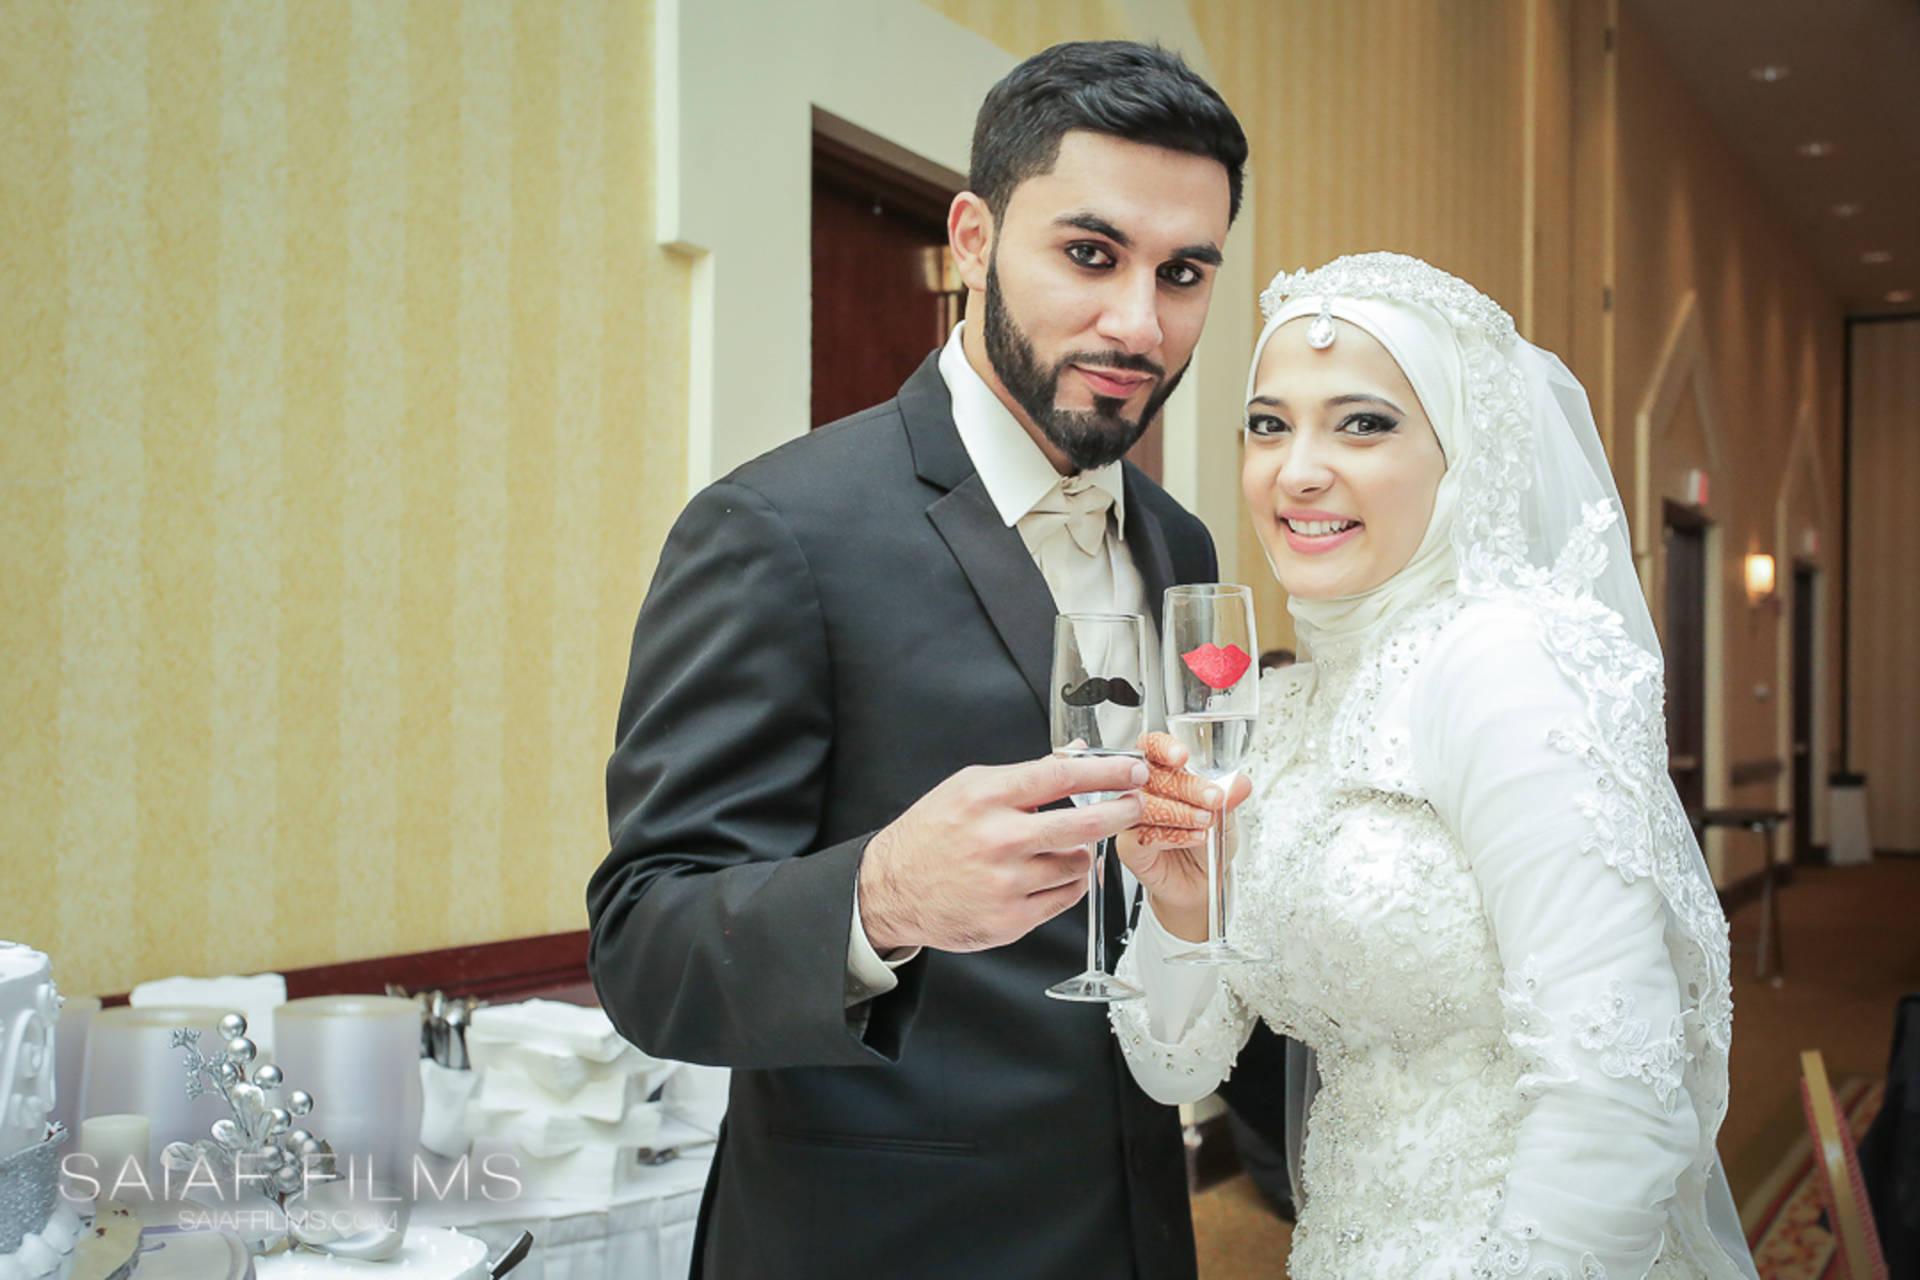 Muslim wedding ceremony pictures 84 best